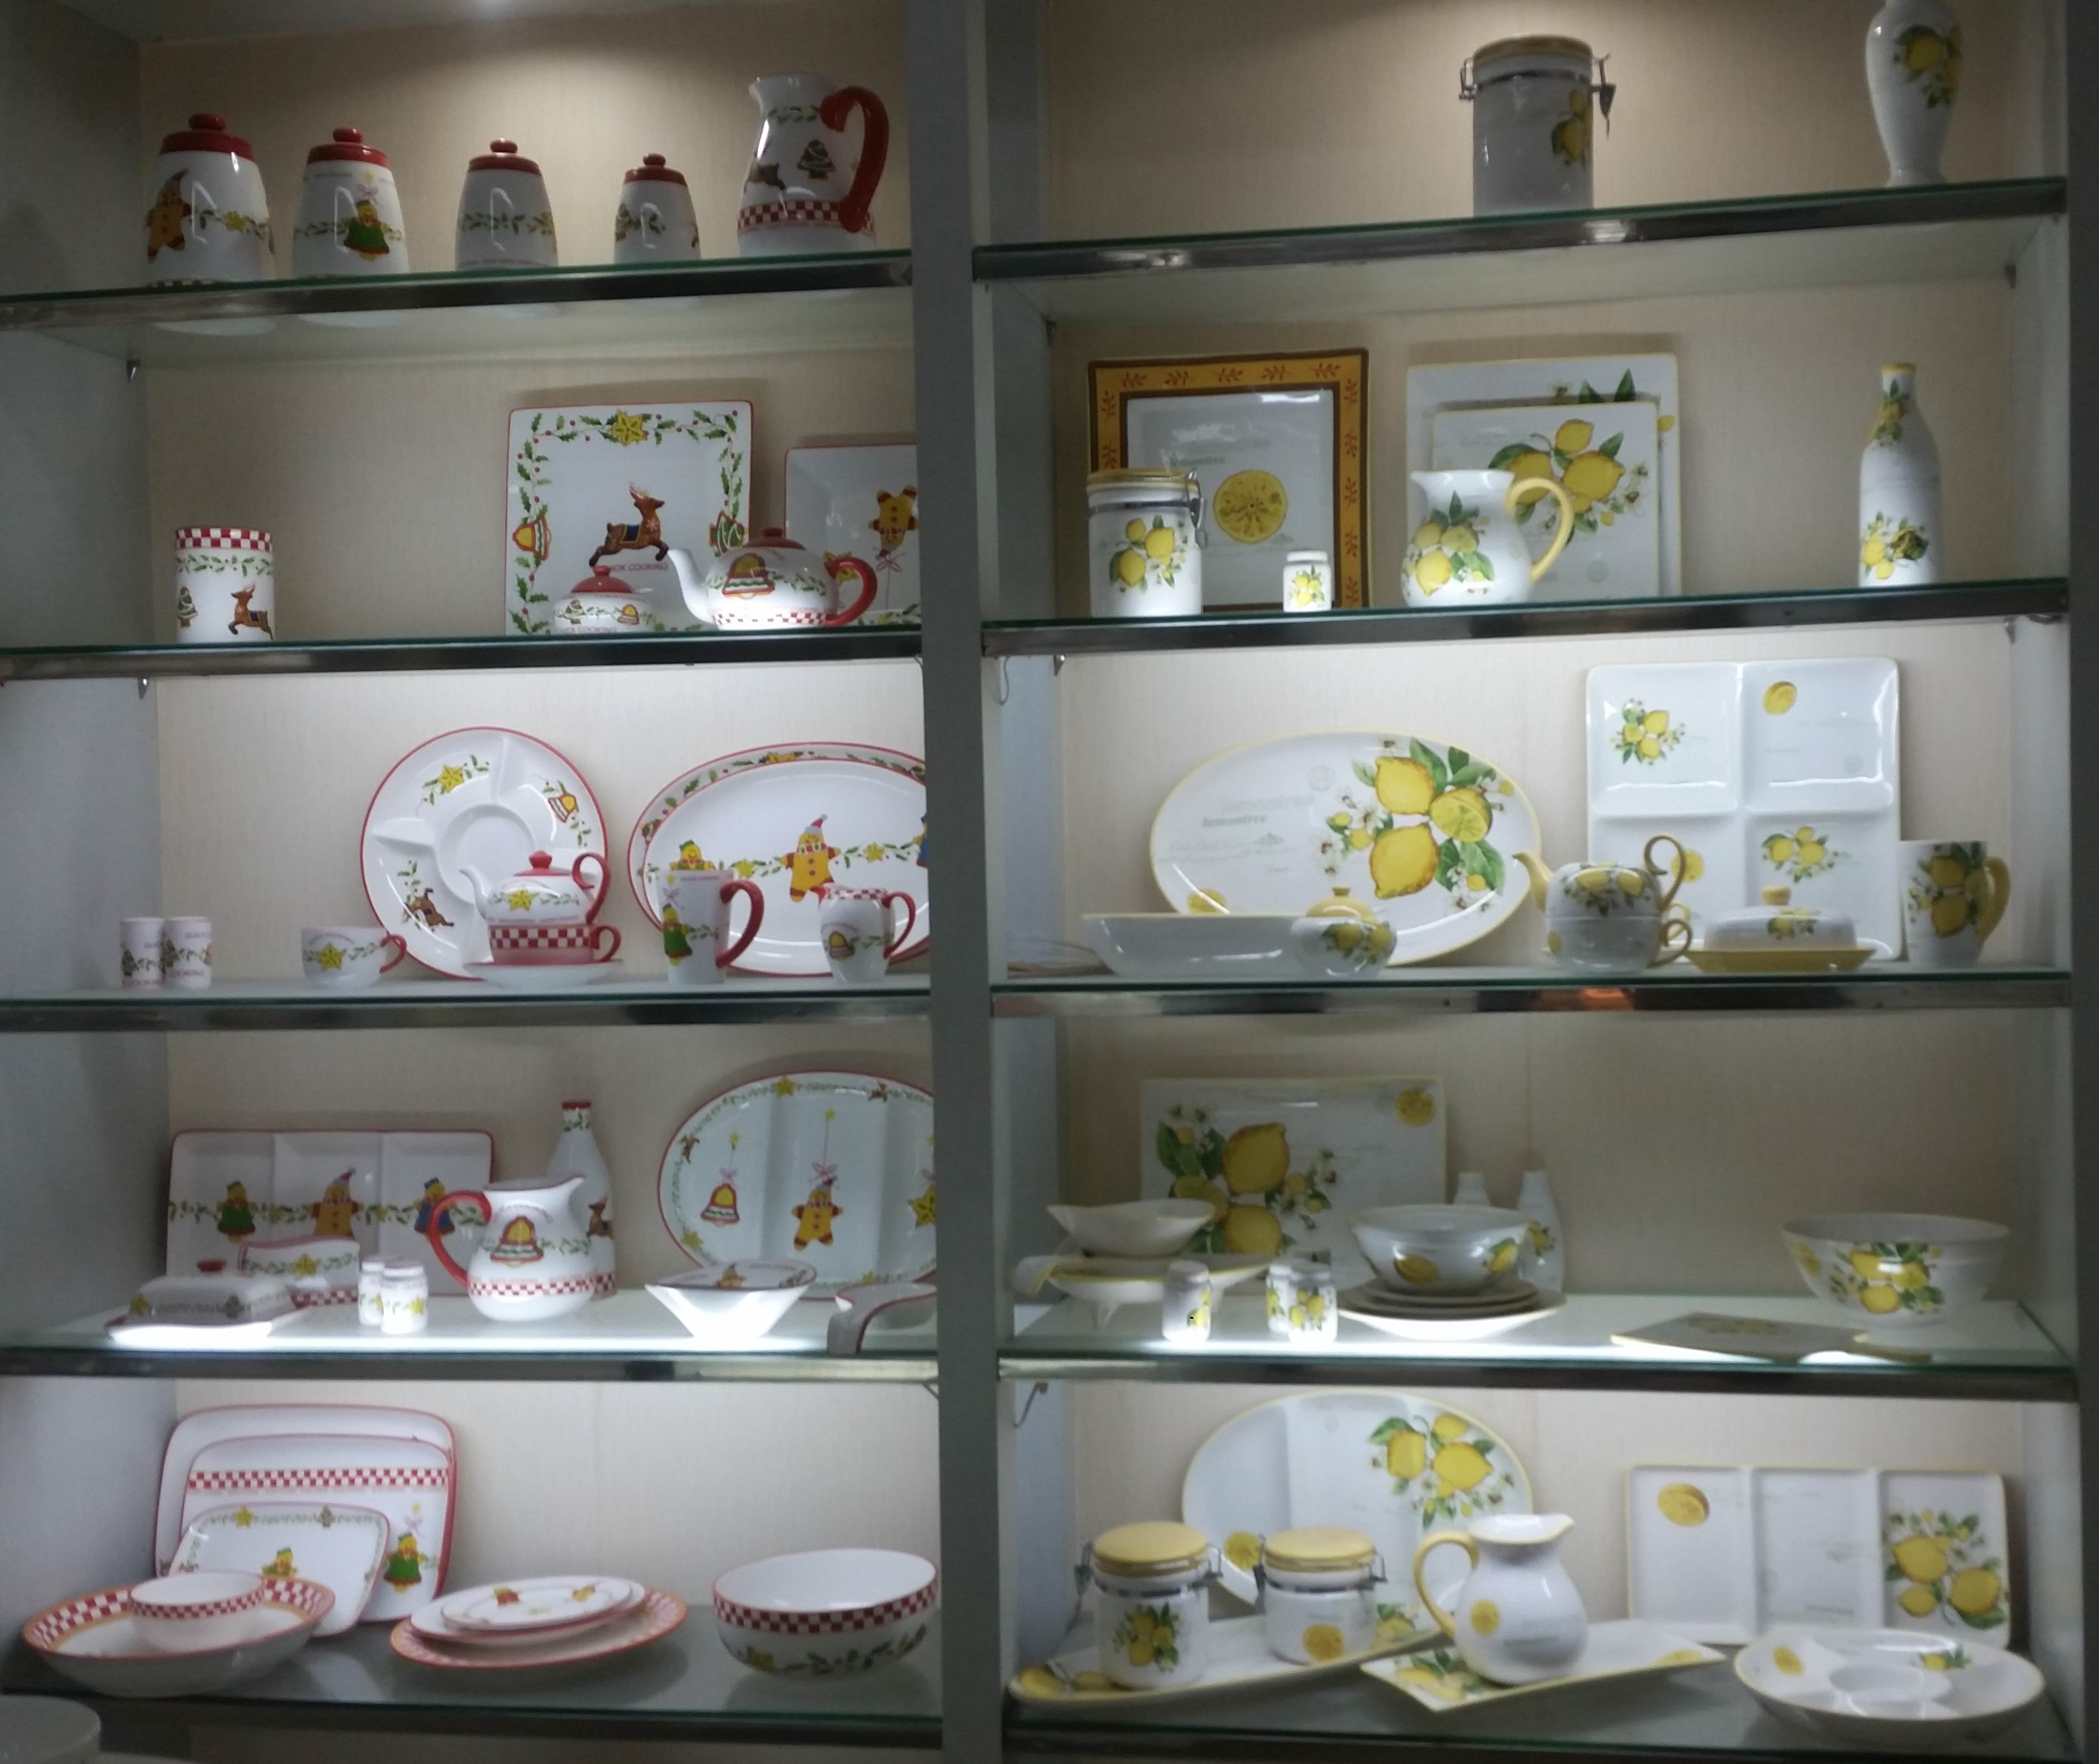 porcelain gravy boats,porcelain tableware,porcelain dinnerware sets